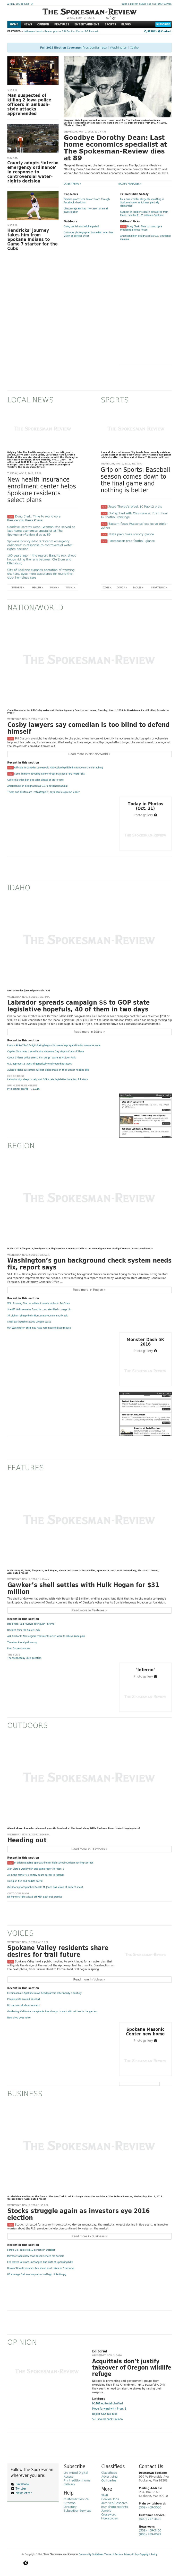 The (Spokane) Spokesman-Review at Wednesday Nov. 2, 2016, 11:18 p.m. UTC